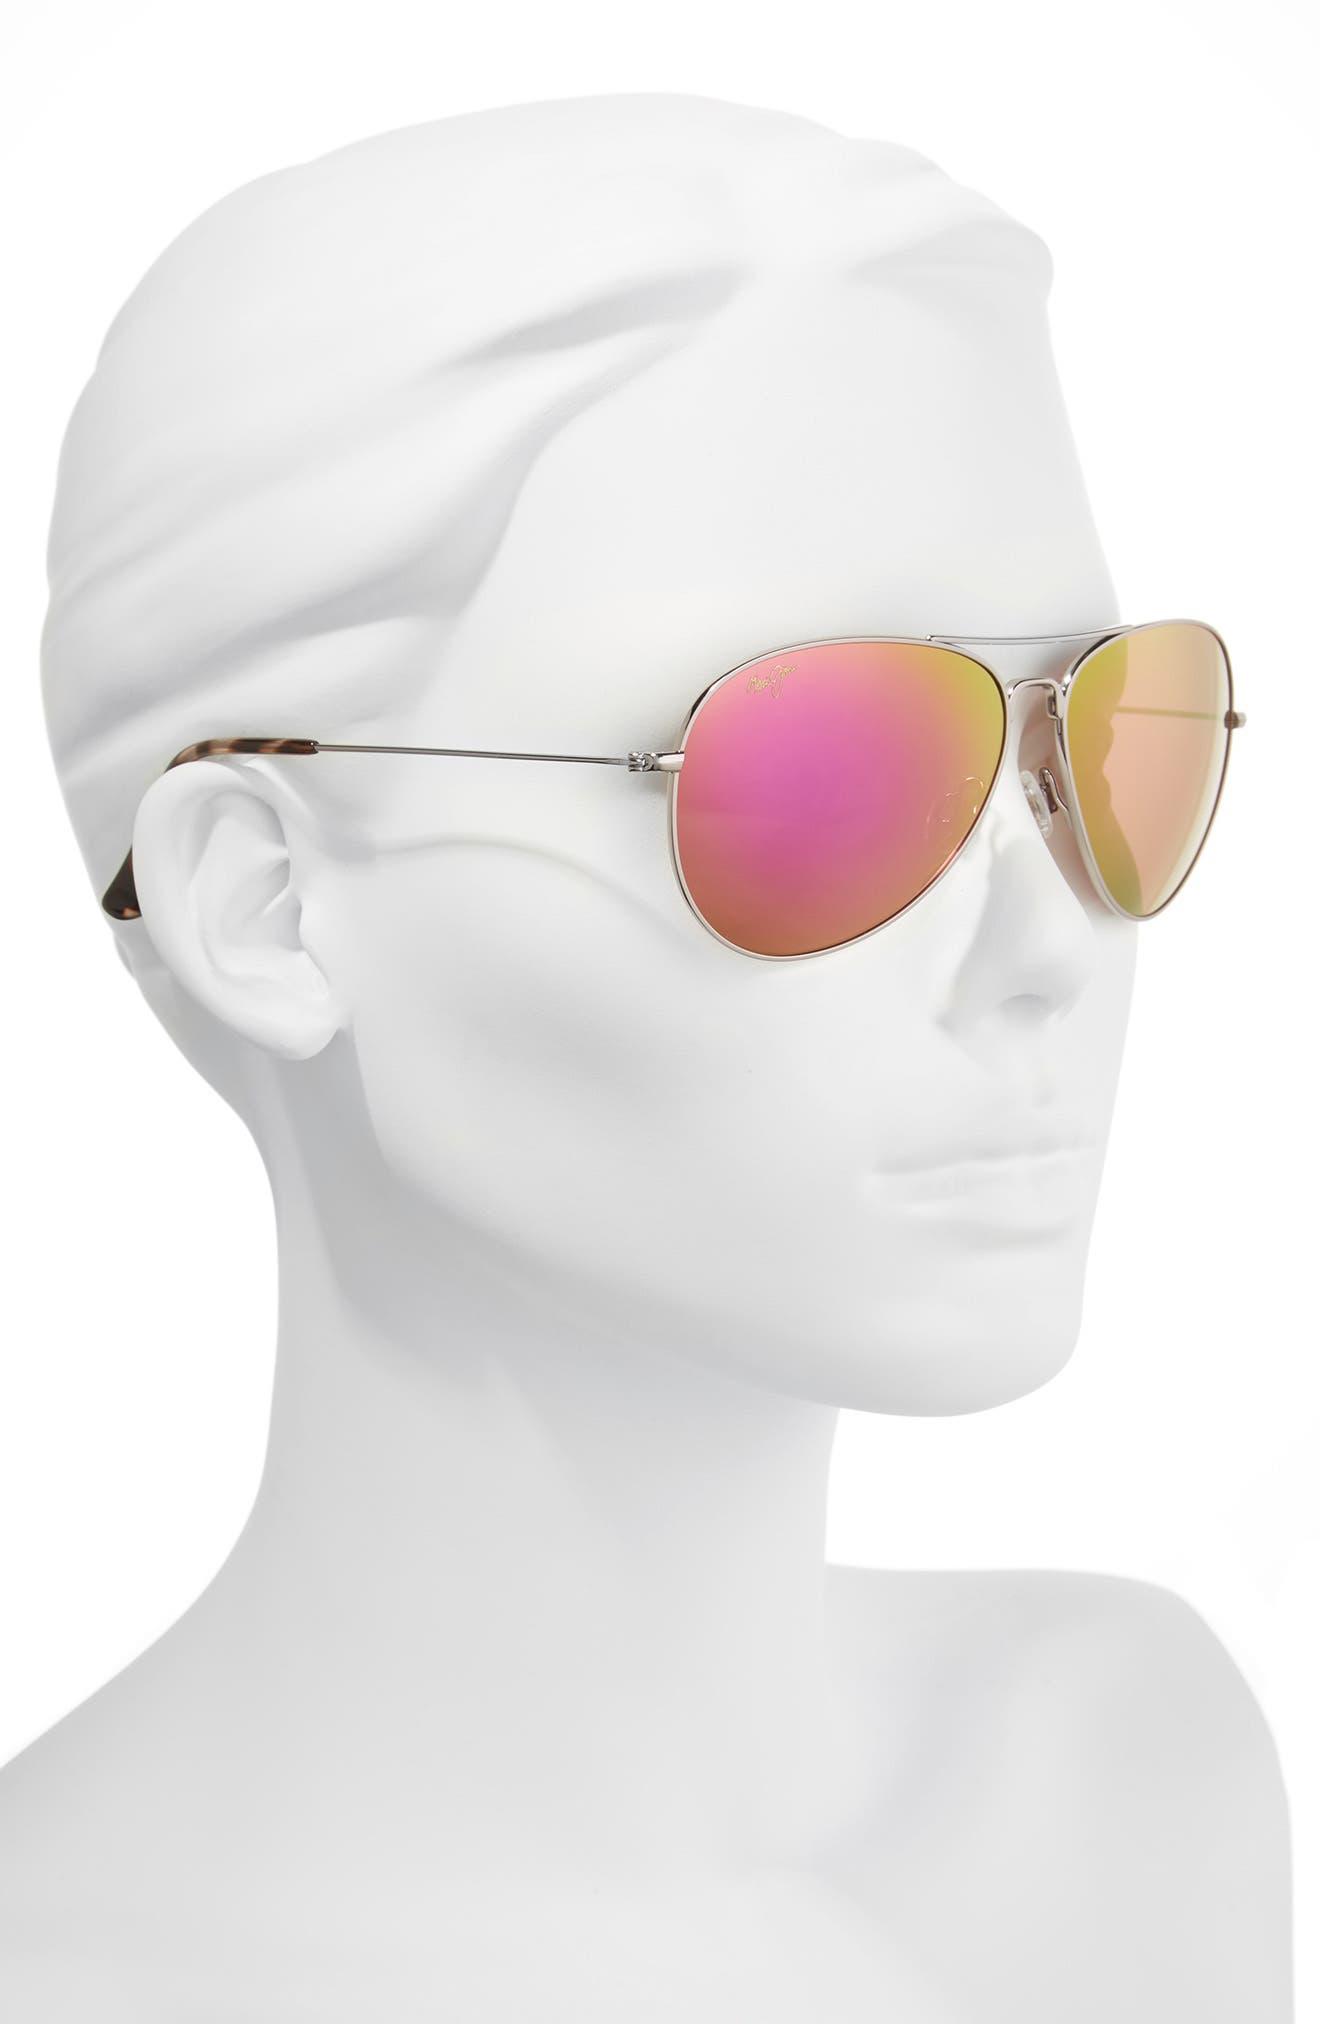 Mavericks 61mm PolarizedPlus2<sup>®</sup> Aviator Sunglasses,                             Alternate thumbnail 2, color,                             ROSE GOLD/ MAUI SUNRISE